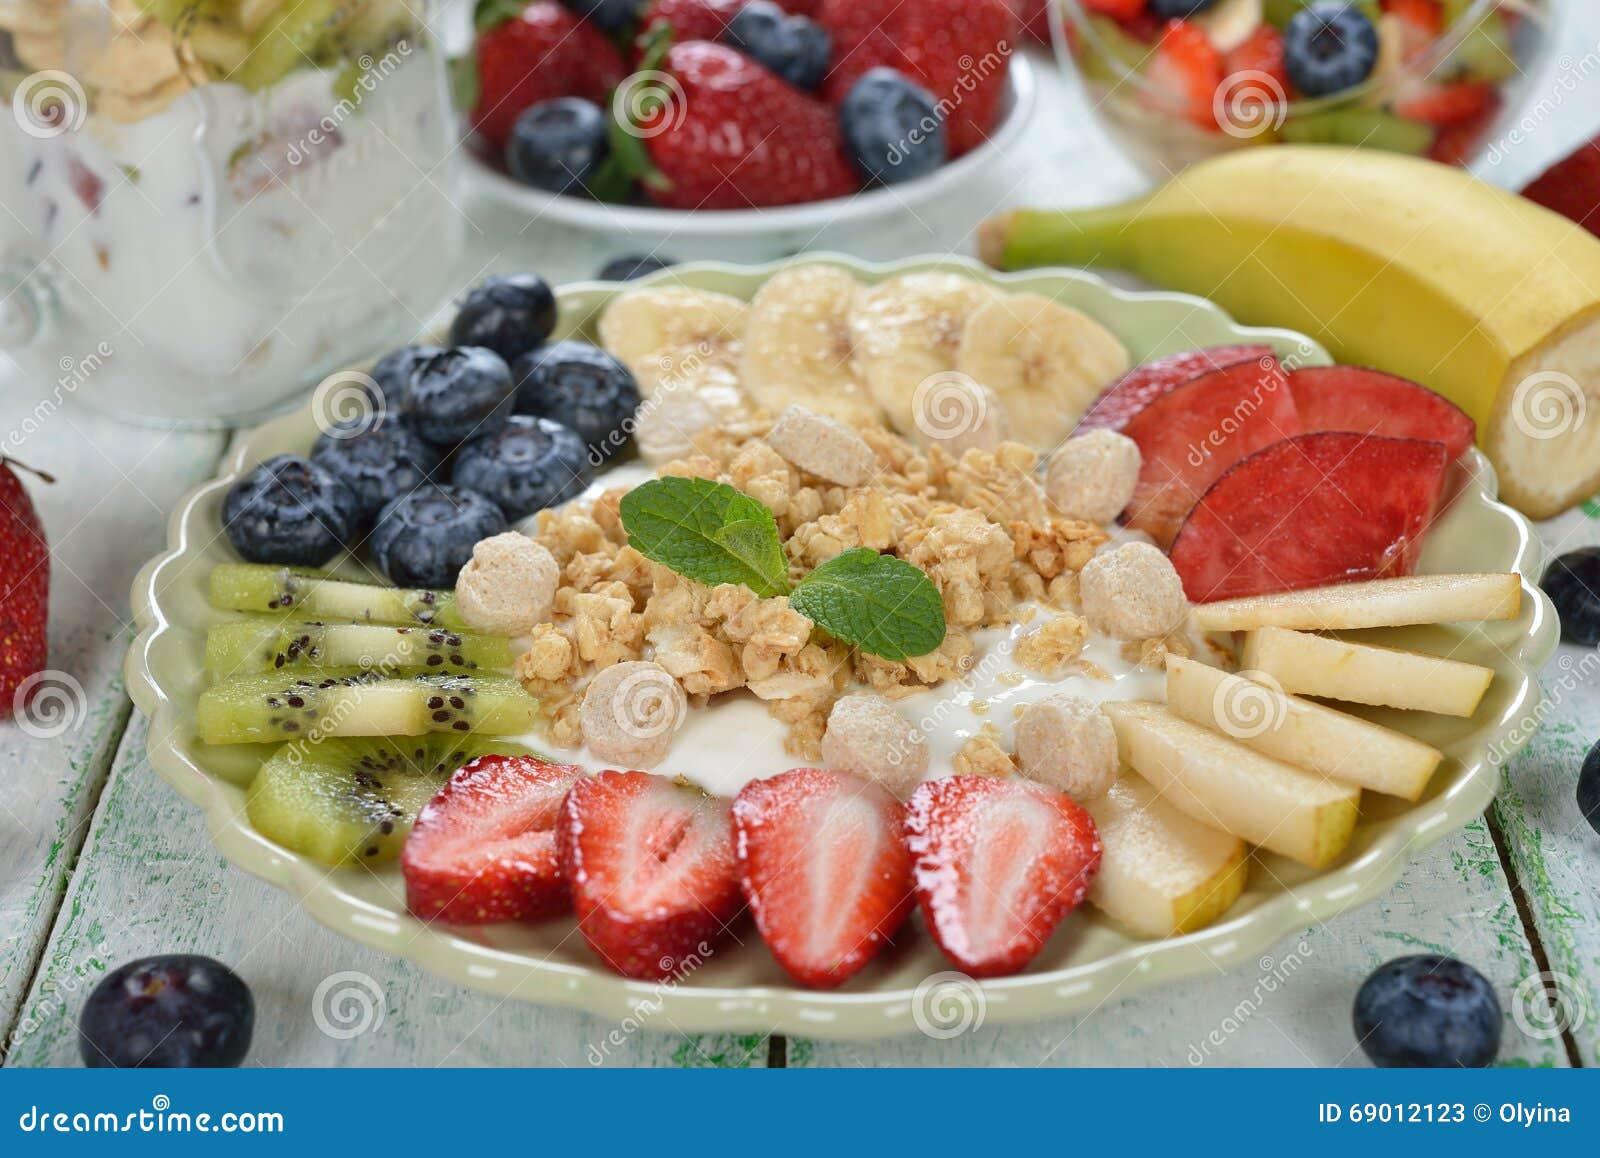 Fruit salad with yogurt and muesli